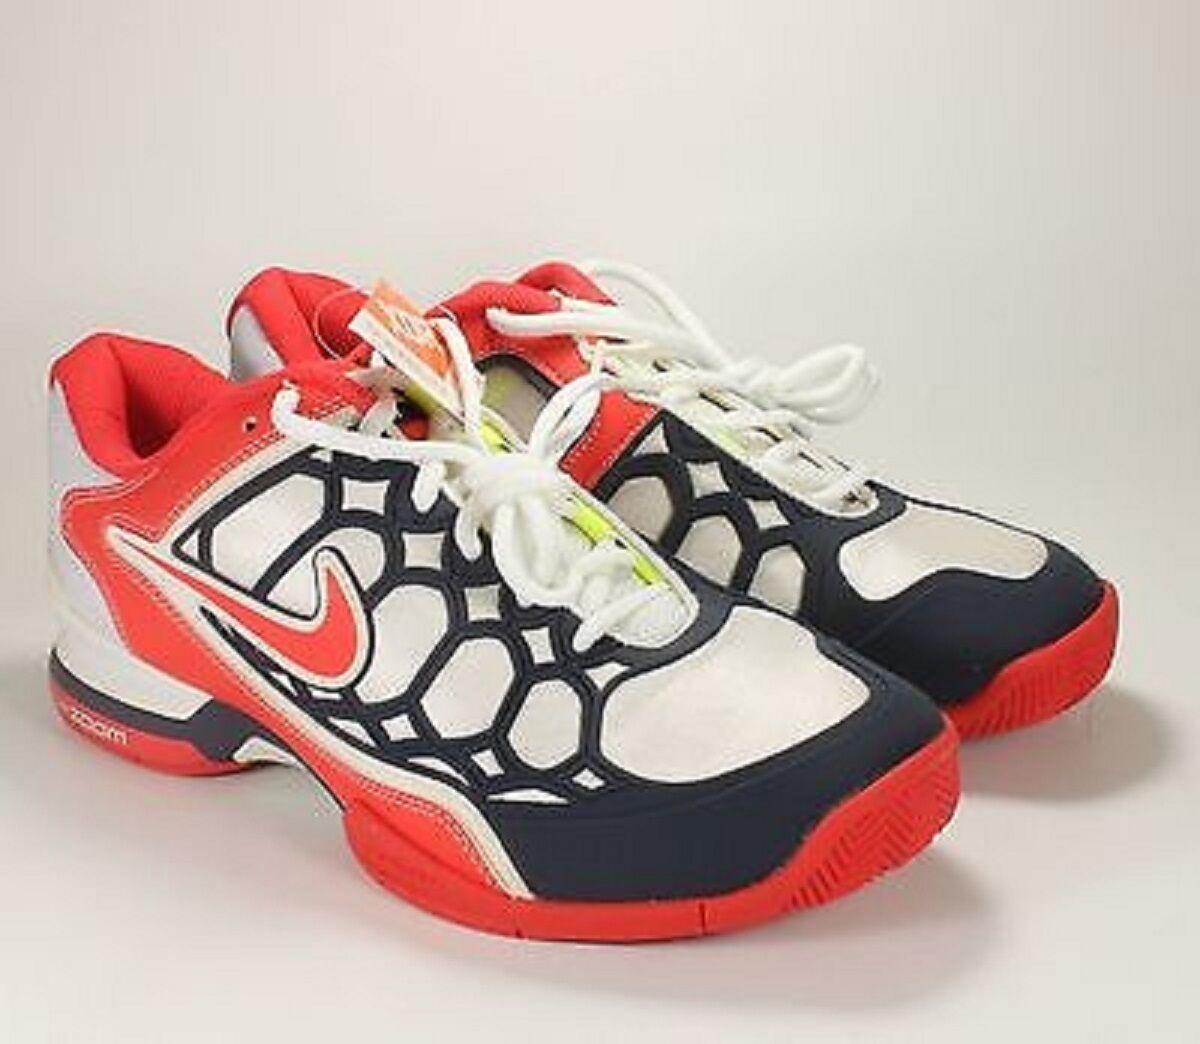 new product d8911 a8390 NEW donna NIKE NIKE NIKE ZOOM BREATHE 2K (bianca SUNBURST blu) TENNIS scarpe.  518294-164 ee280c